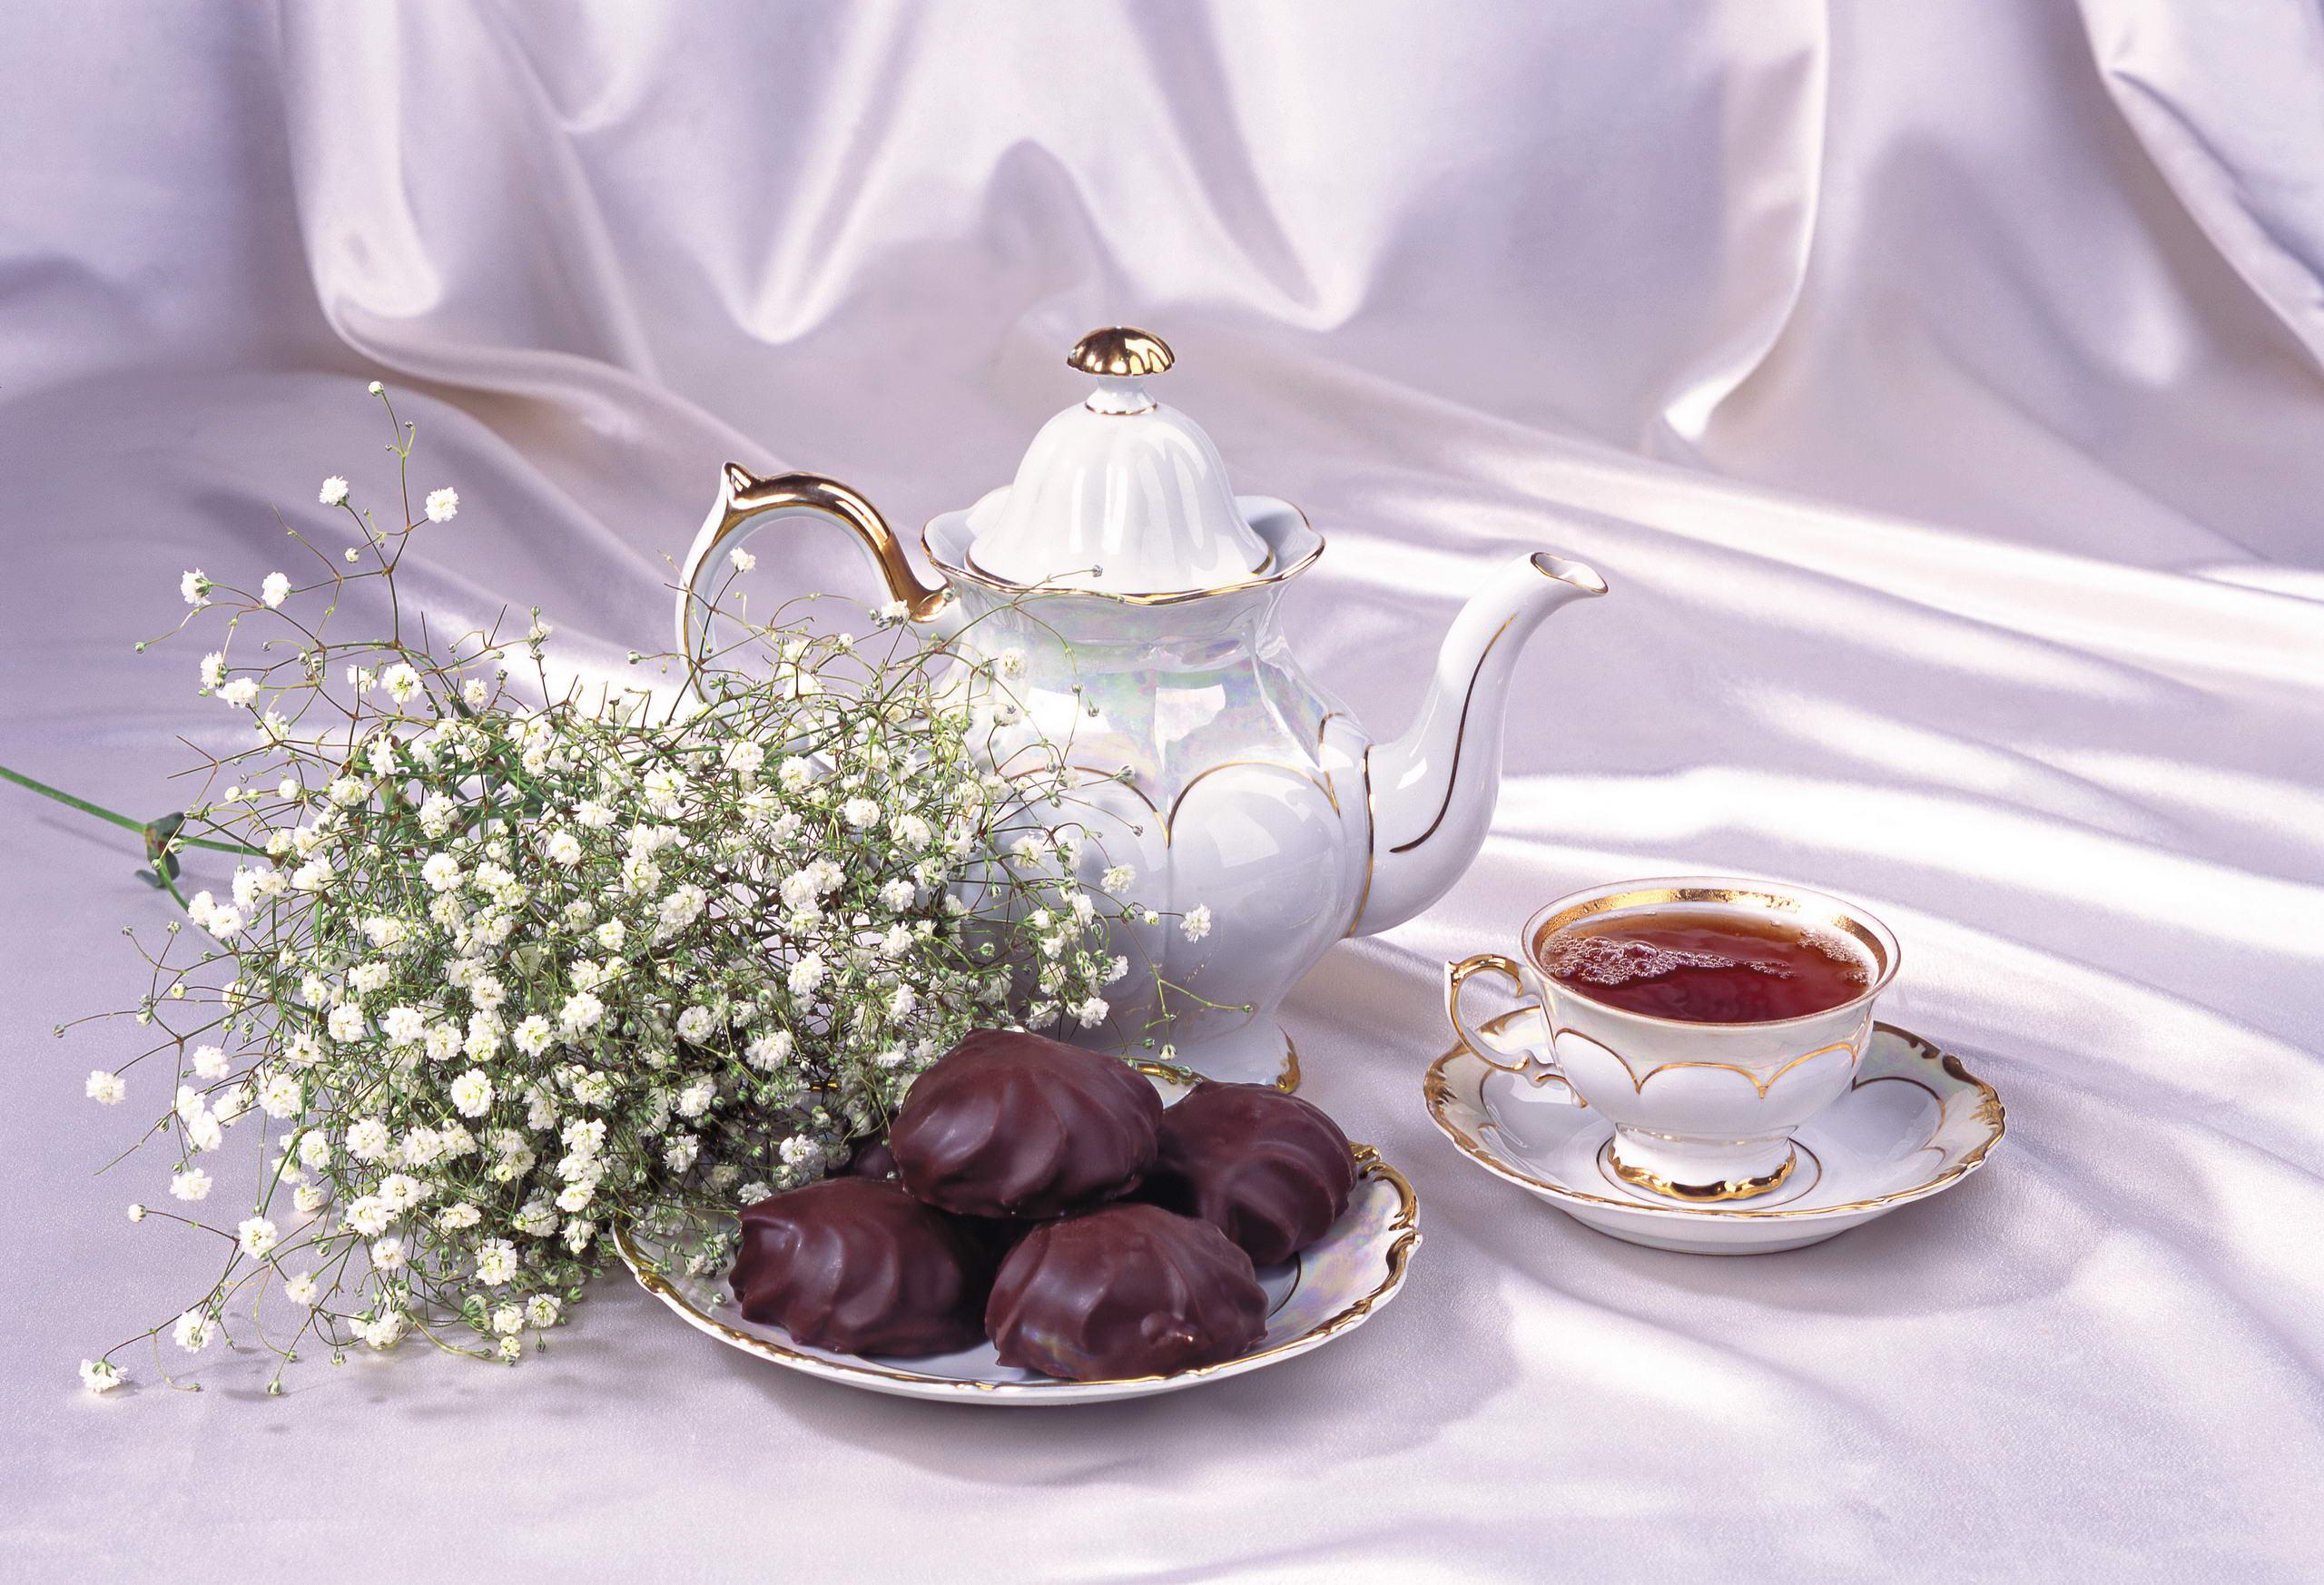 Обои цветы, натюрморт, сервиз, тарелка, стол. Разное foto 10